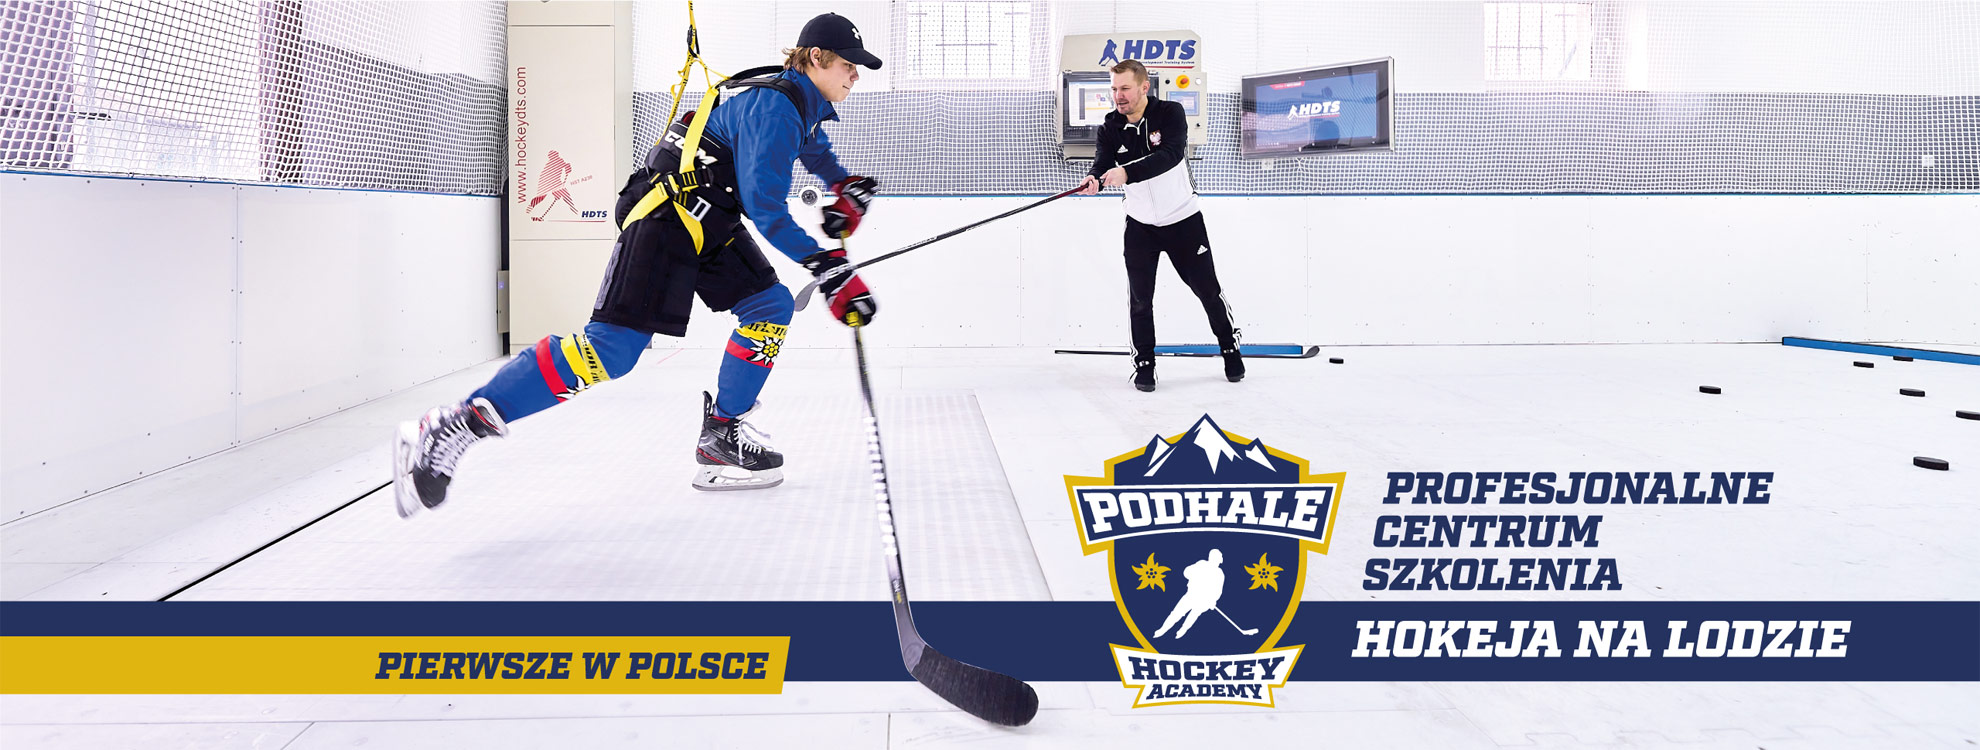 https://podhalehockey.com/wp-content/uploads/2021/04/hokej-na-lodzie-1.jpg